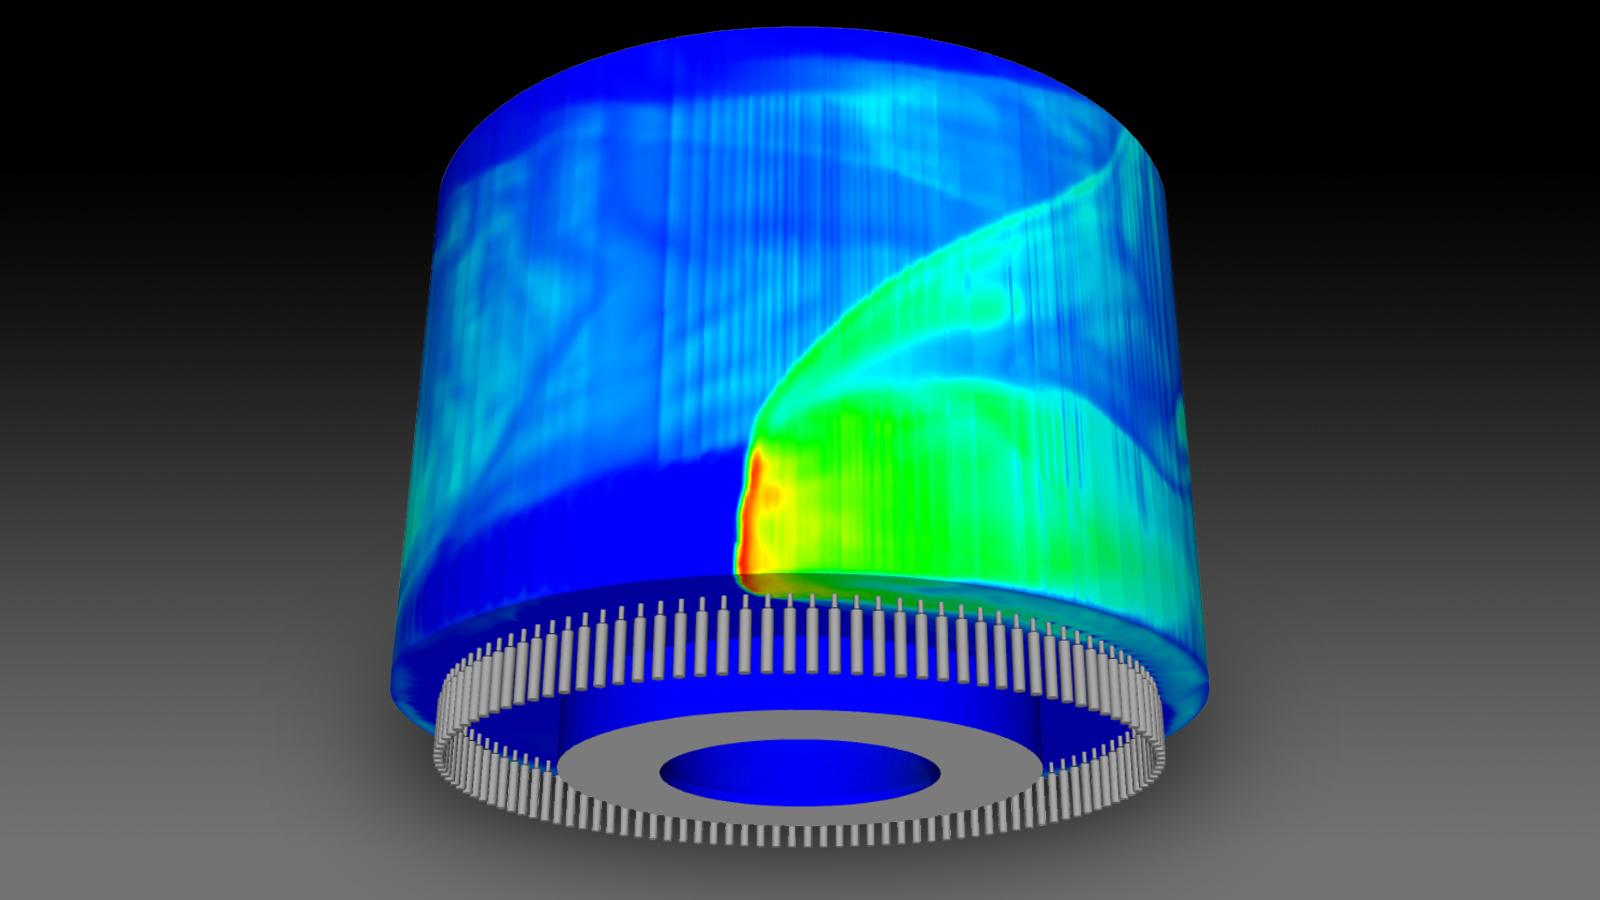 New Argonne computational model to accelerate engine